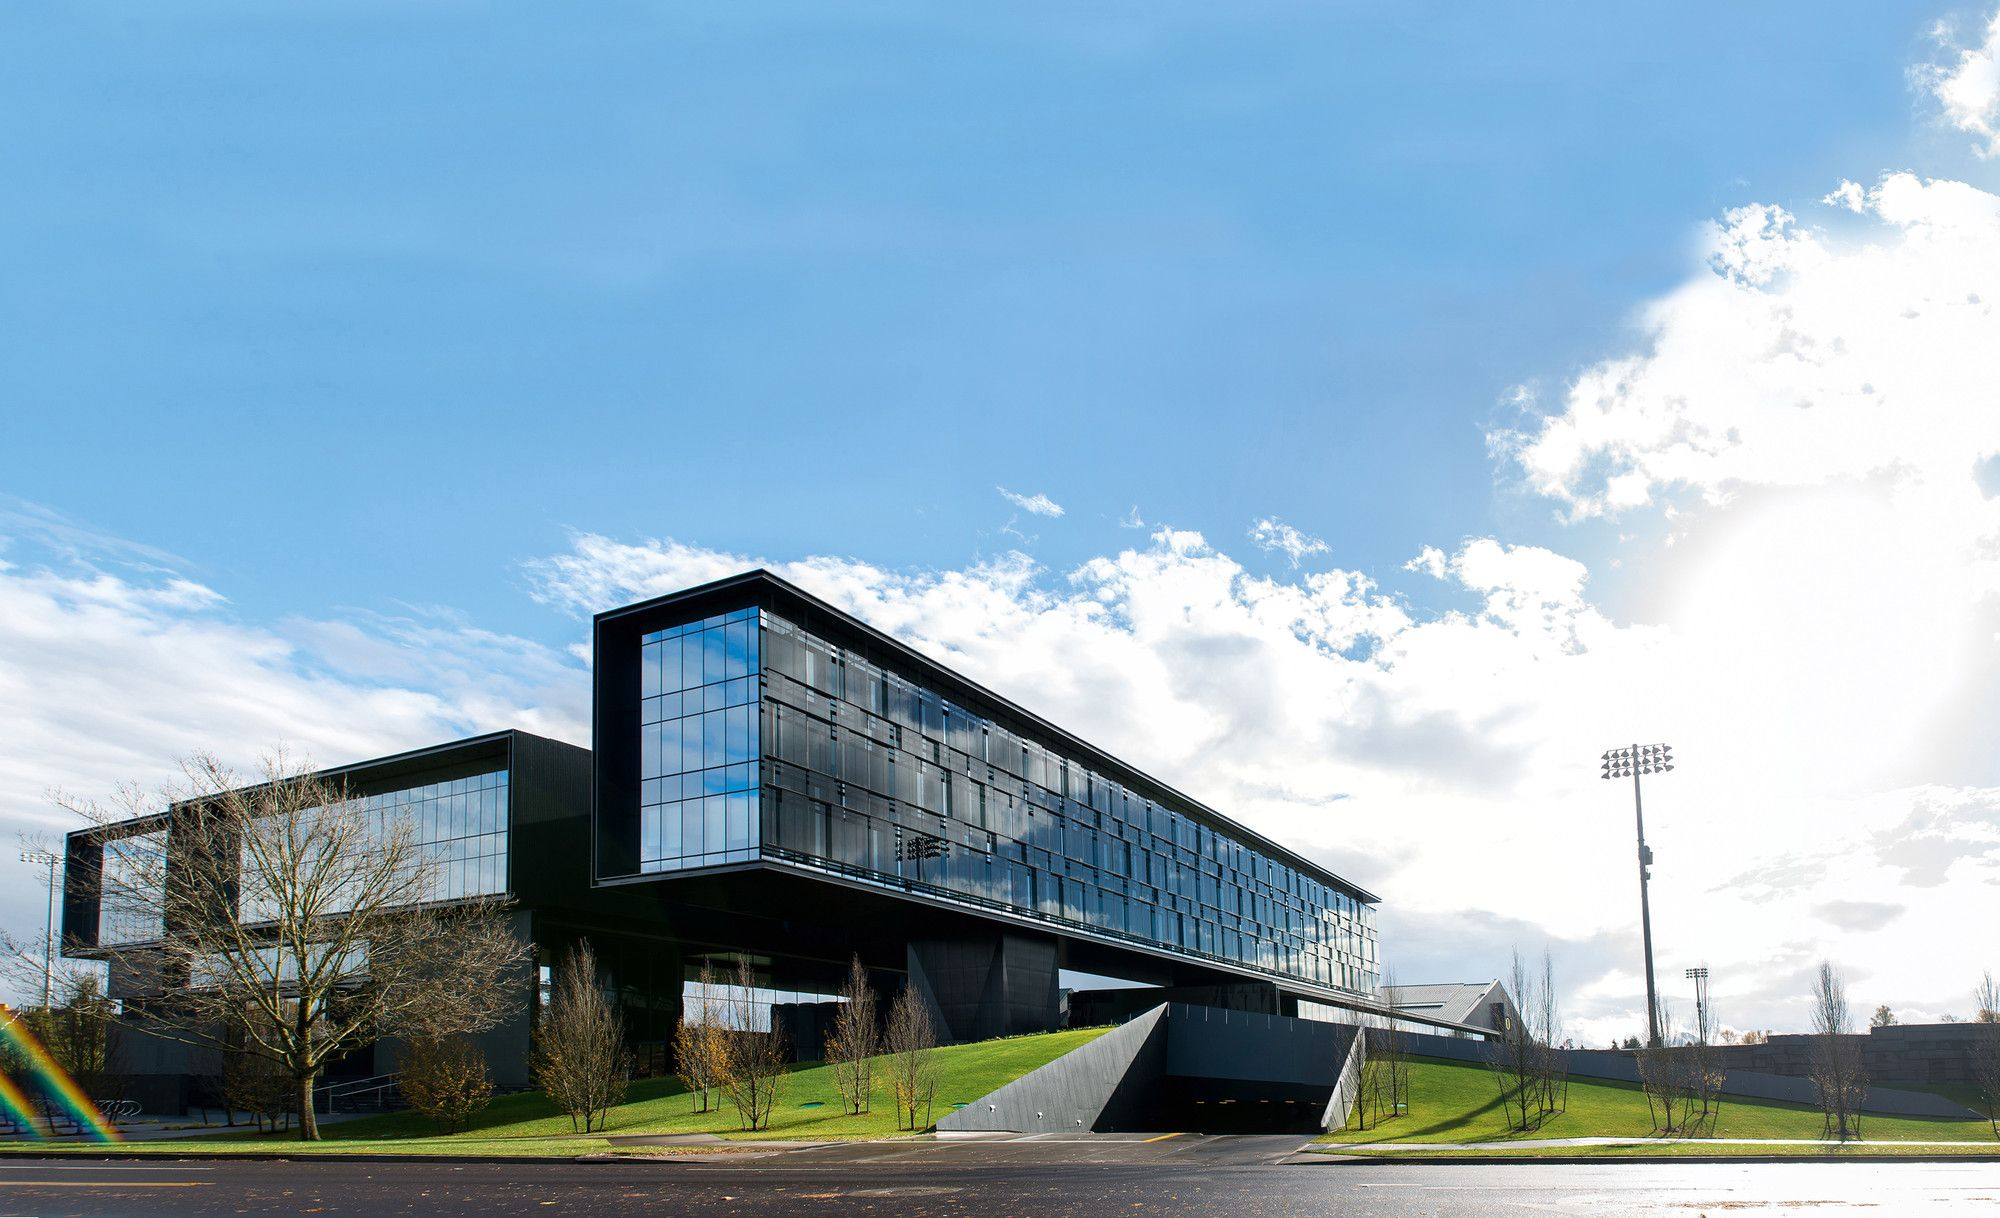 Gallery Of University Of Oregon Hatfield Dowlin Complex Zgf Architects 3 University Architecture Architecture Details University Of Oregon